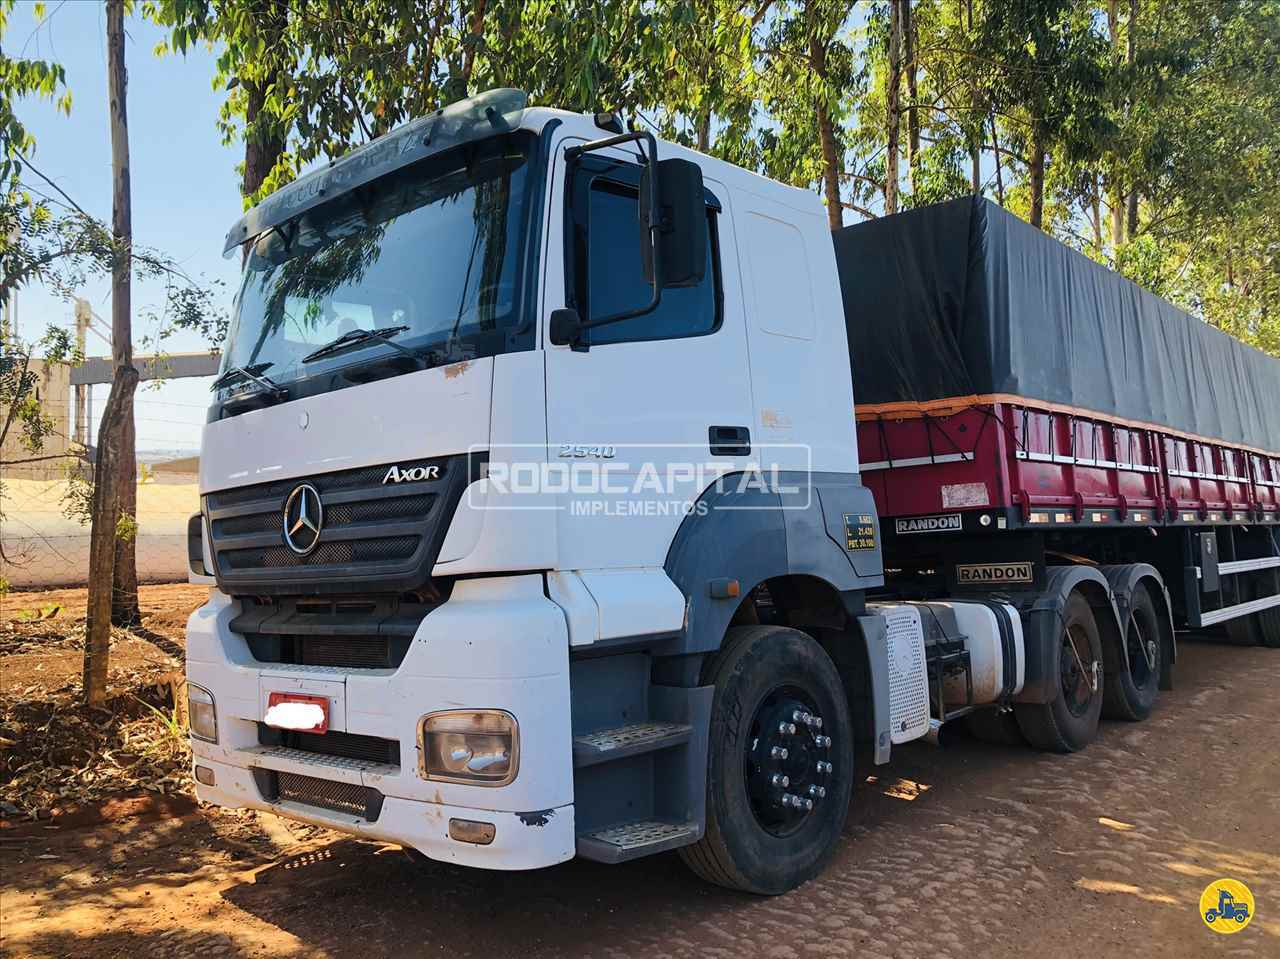 CAMINHAO MERCEDES-BENZ MB 2540 Cavalo Mecânico Truck 6x2 RODOCAPITAL - TRUCKVAN BRASILIA DISTRITO FEDERAL DF